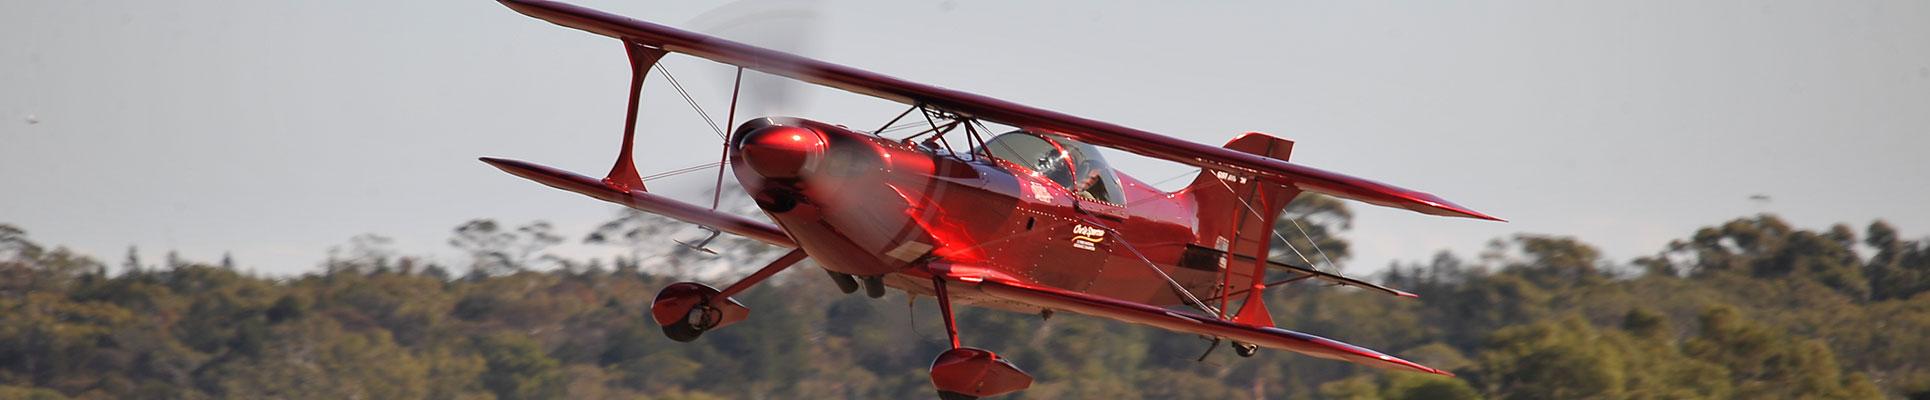 Barossa-Airshow-Barossa-Valley-3